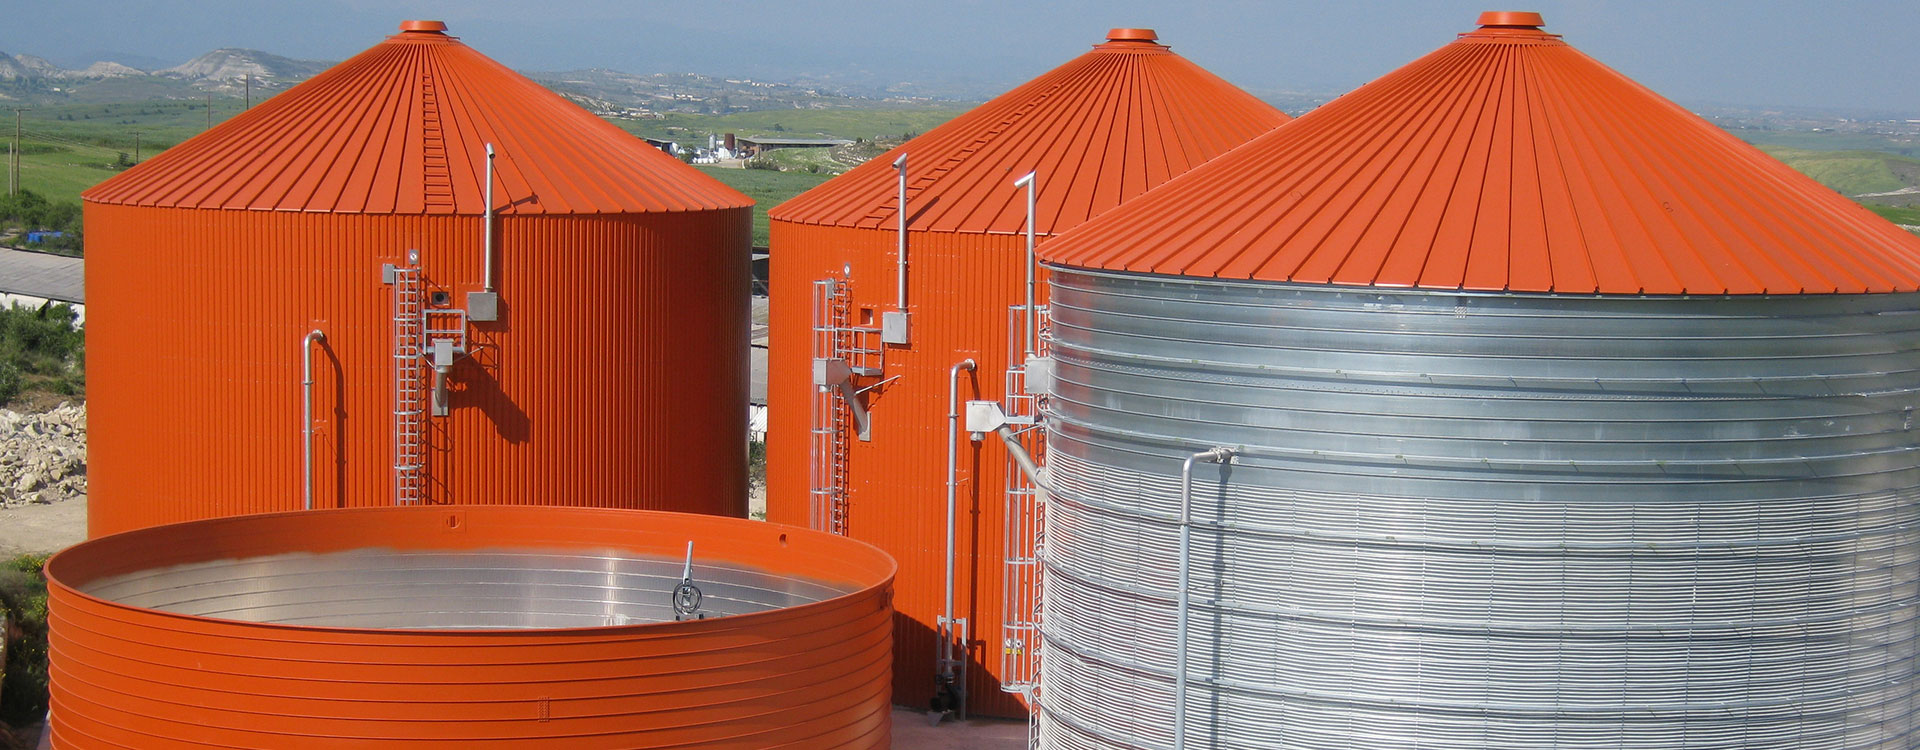 Lipp Guellebehaelter Biogas